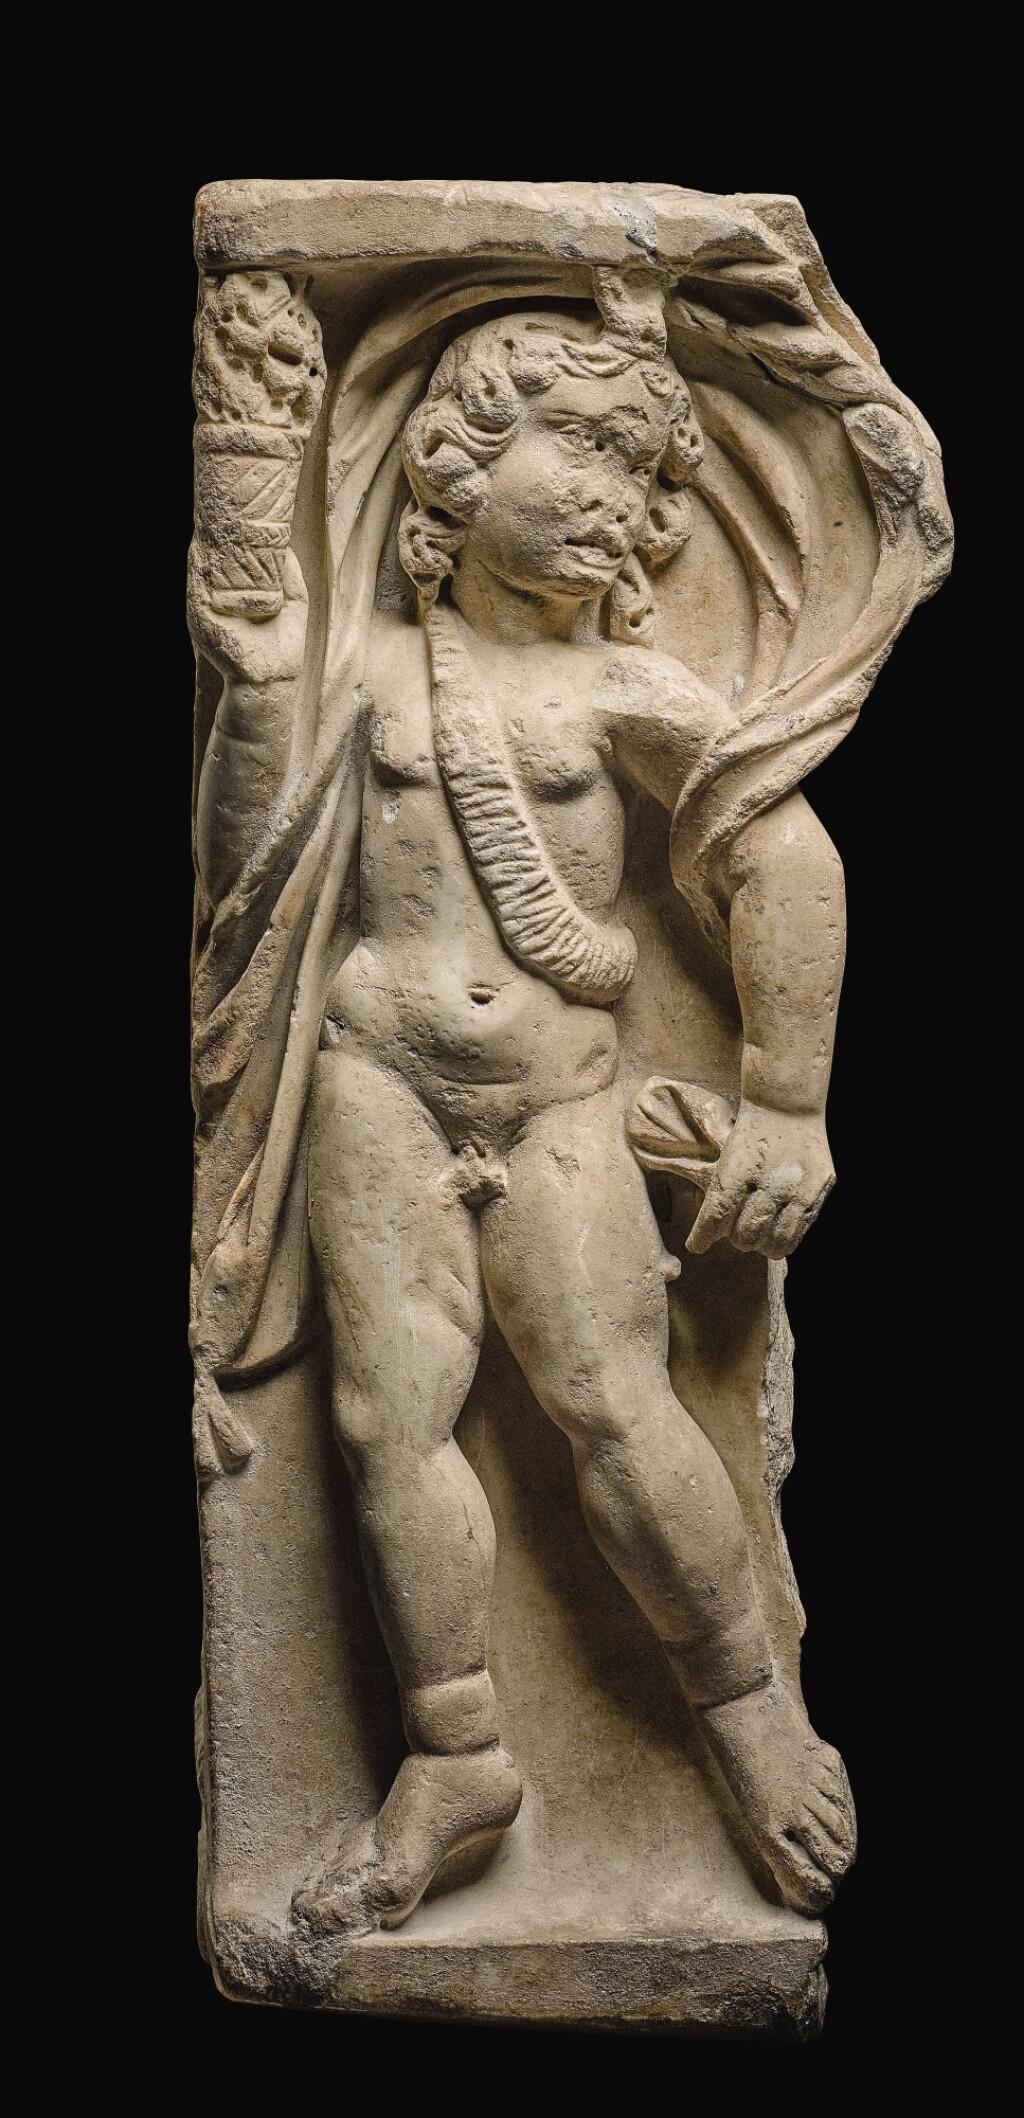 A ROMAN MARBLE SEASON SARCOPHAGUS RELIEF FRAGMENT, 3RD CENTURY A.D.